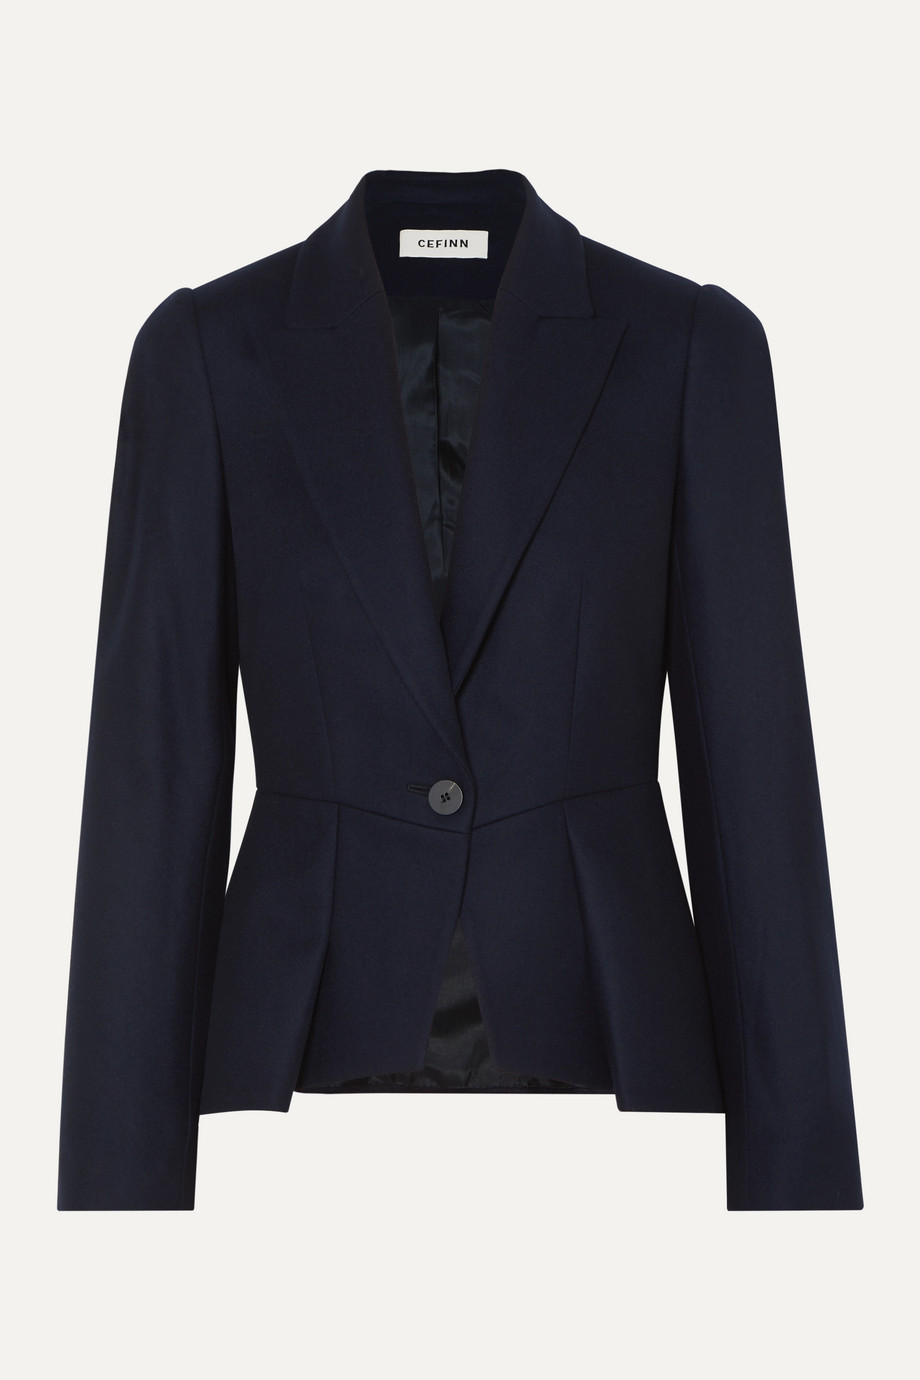 Cefinn Audrey pleated wool-blend blazer